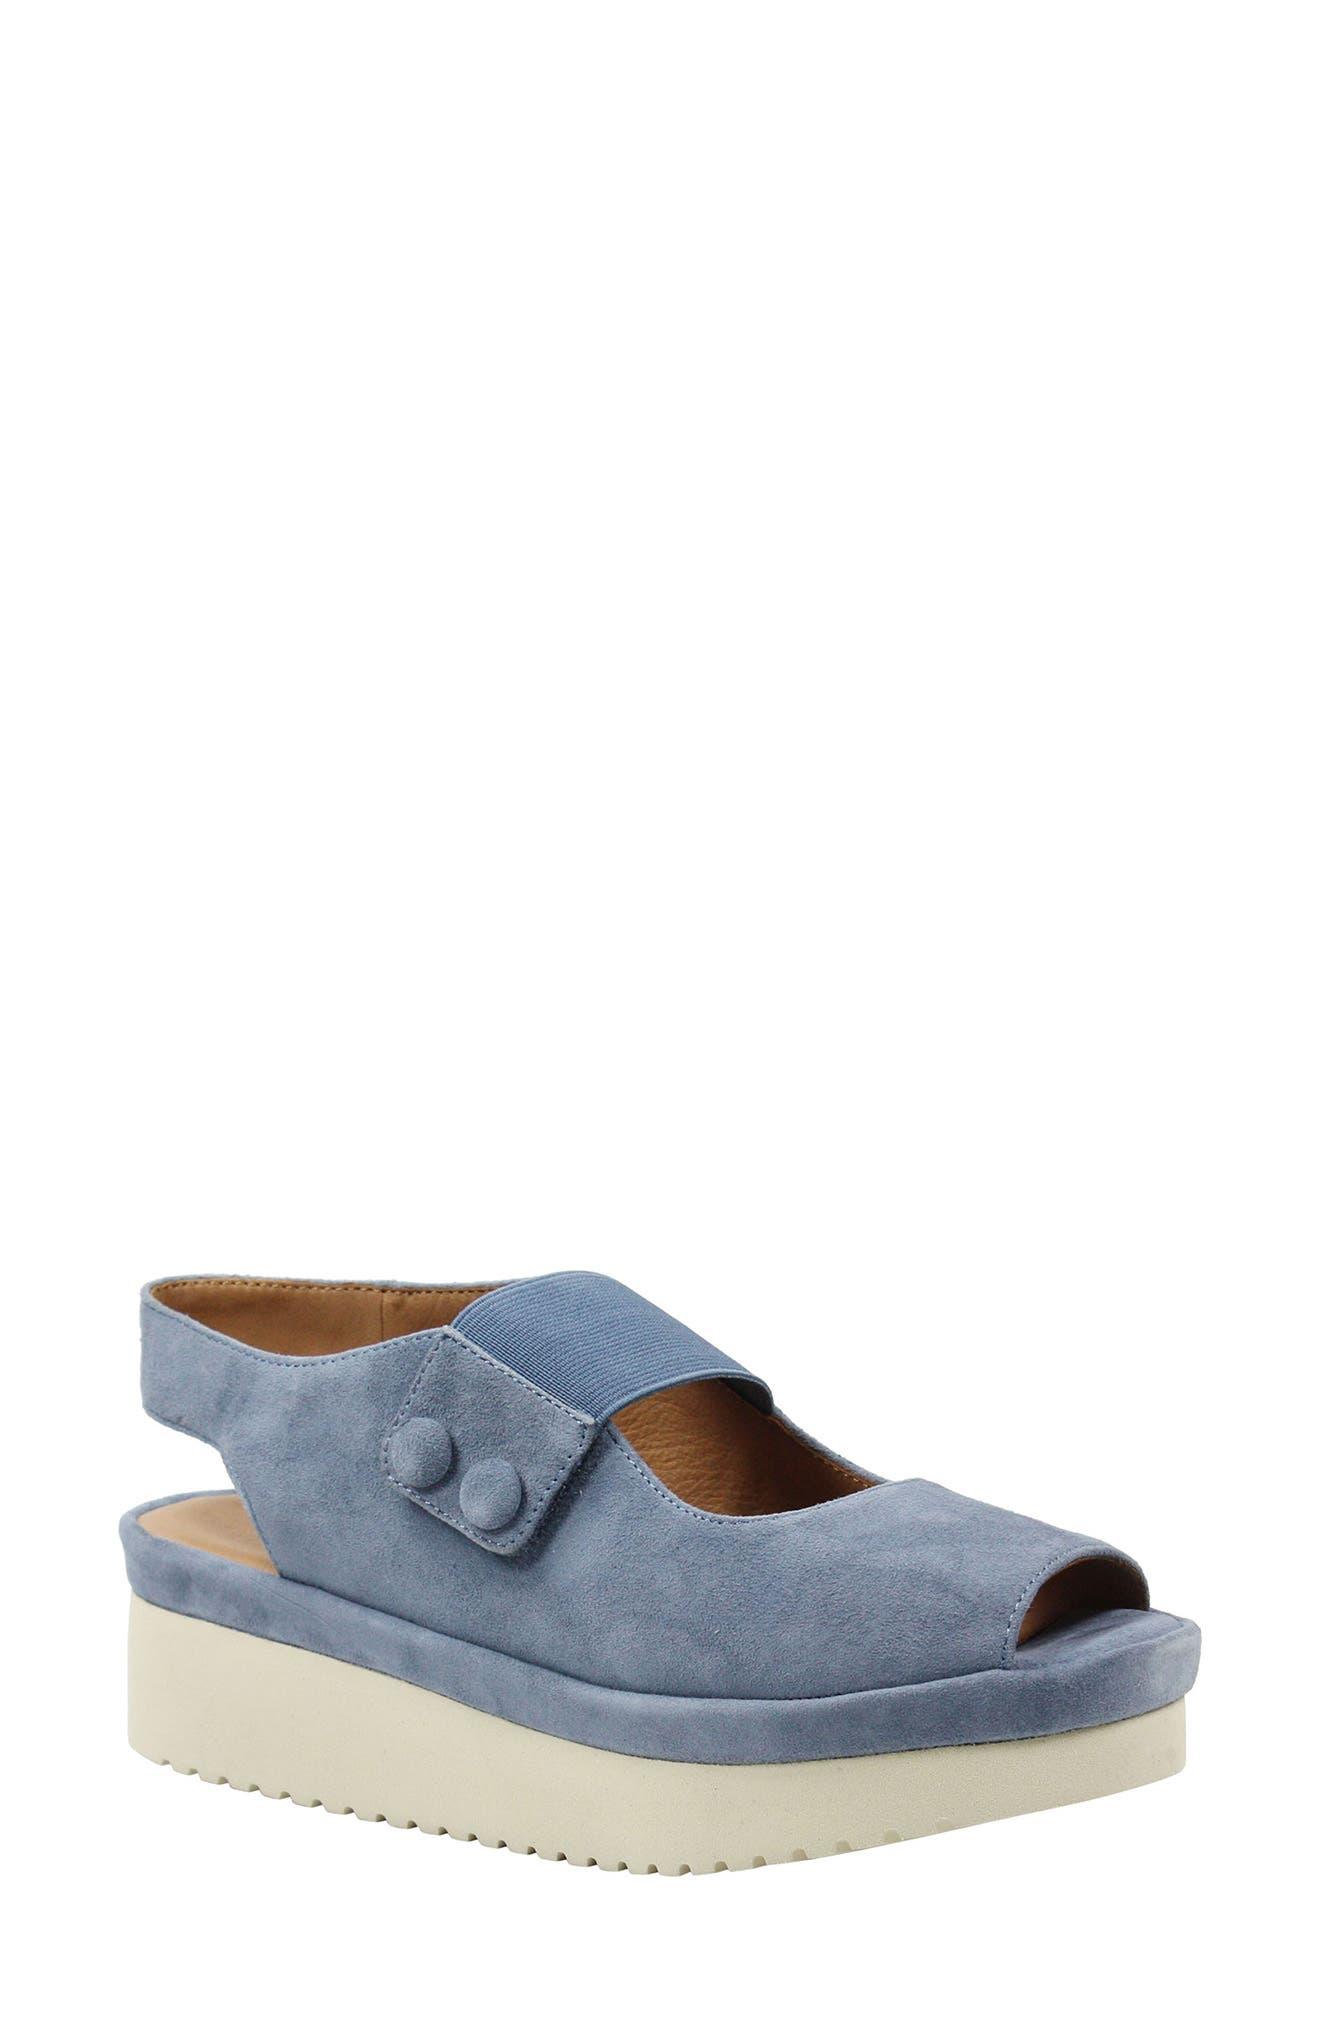 L'AMOUR DES PIEDS Adalicia Platform Sandal, Main, color, INK KID SUEDE